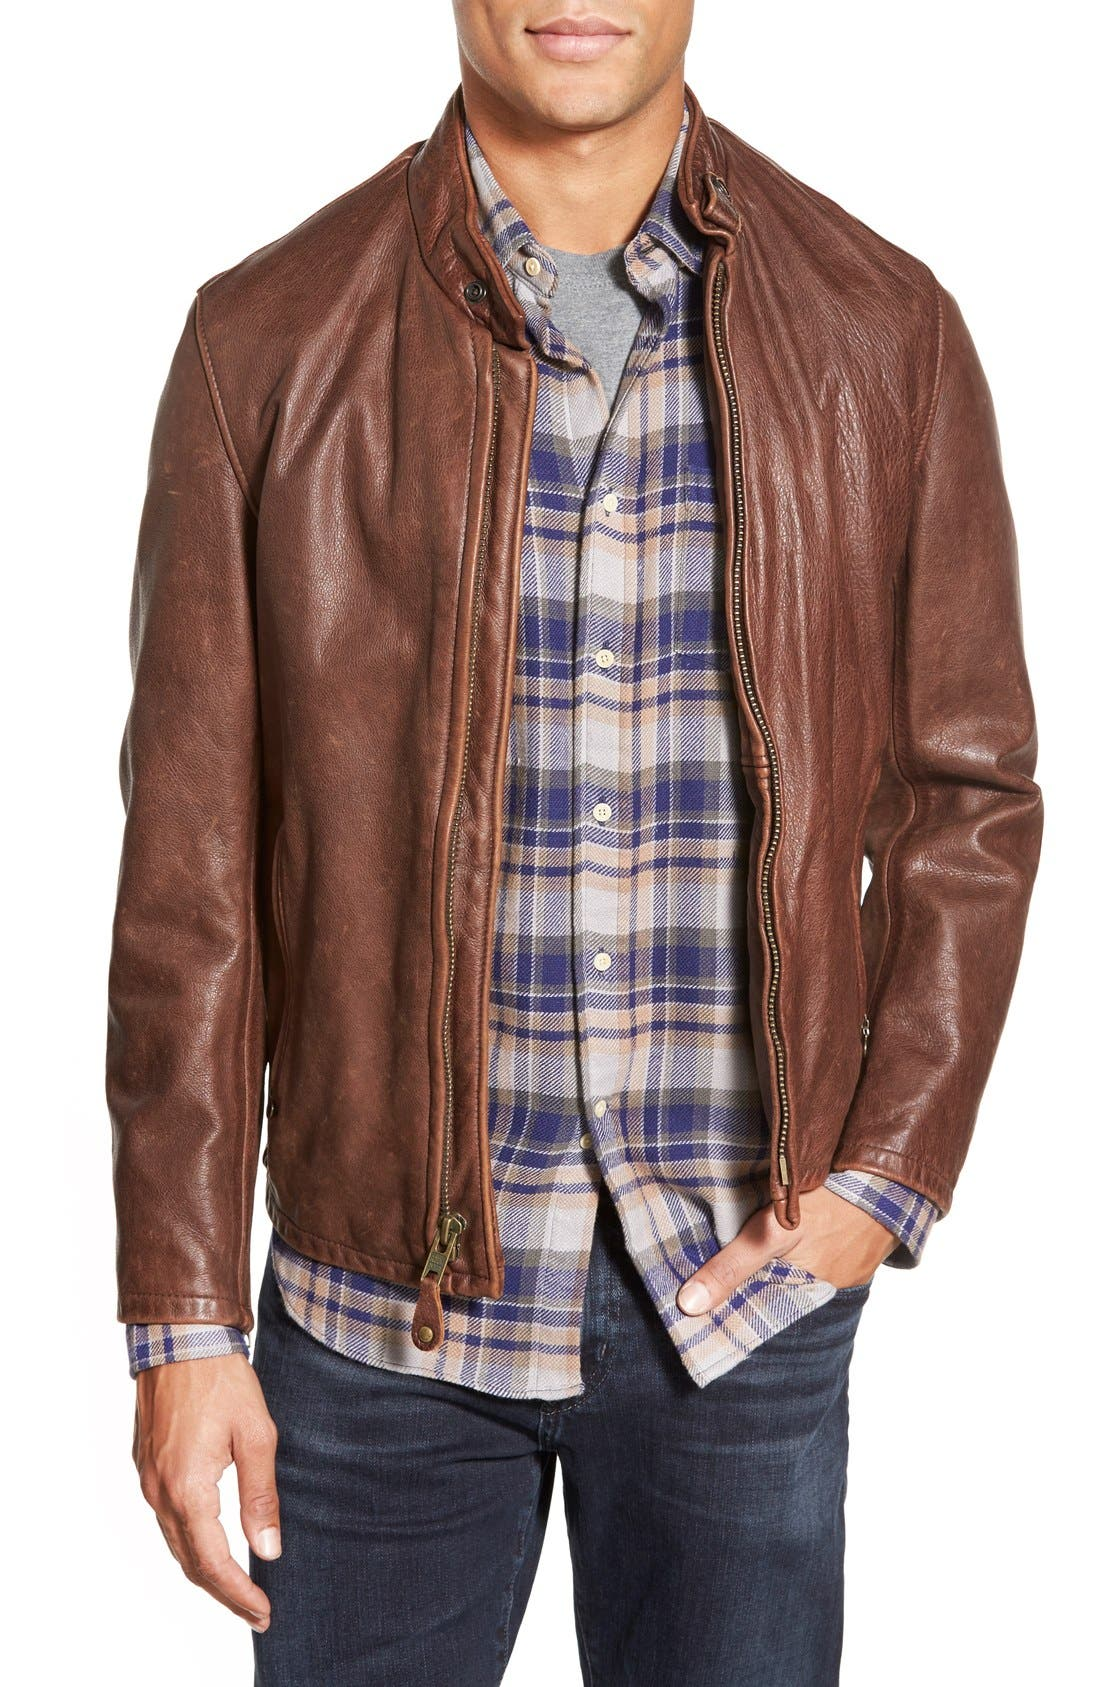 Mens brown leather jacket h&m